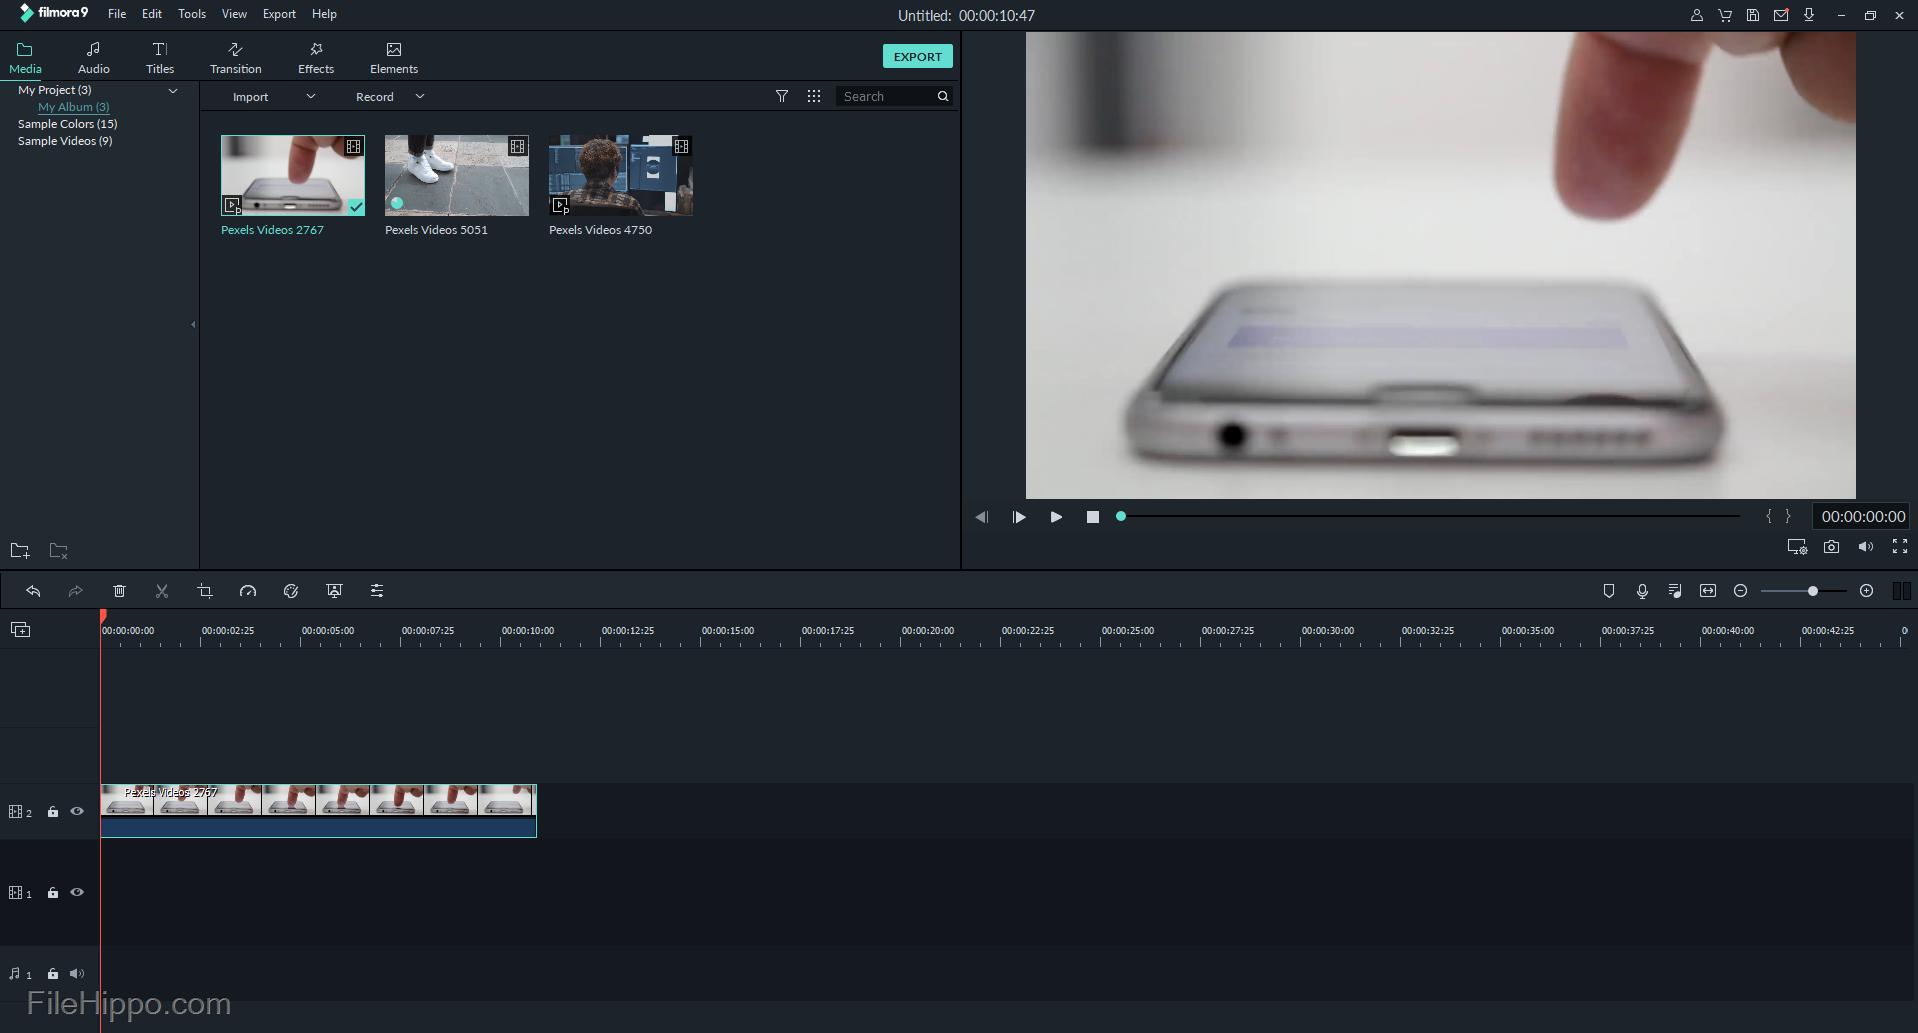 Filmora Video Editor 7.3.2 Video editing, Royalty free